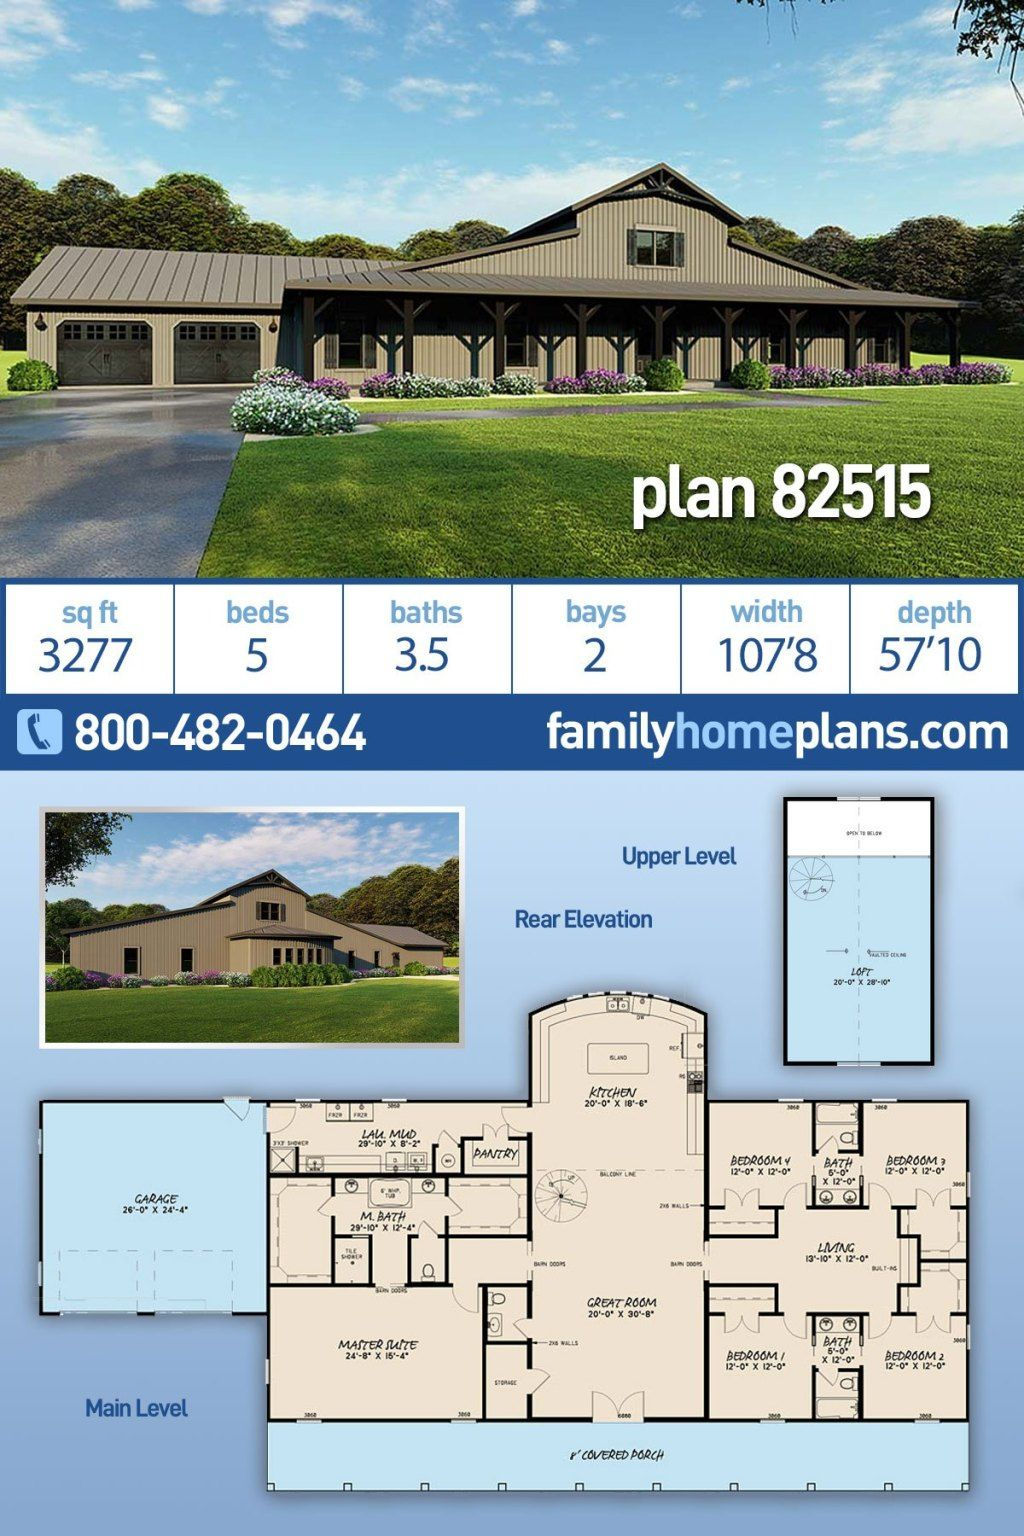 5 Bedroom Barn Style House Plan Family Home Plans Blog